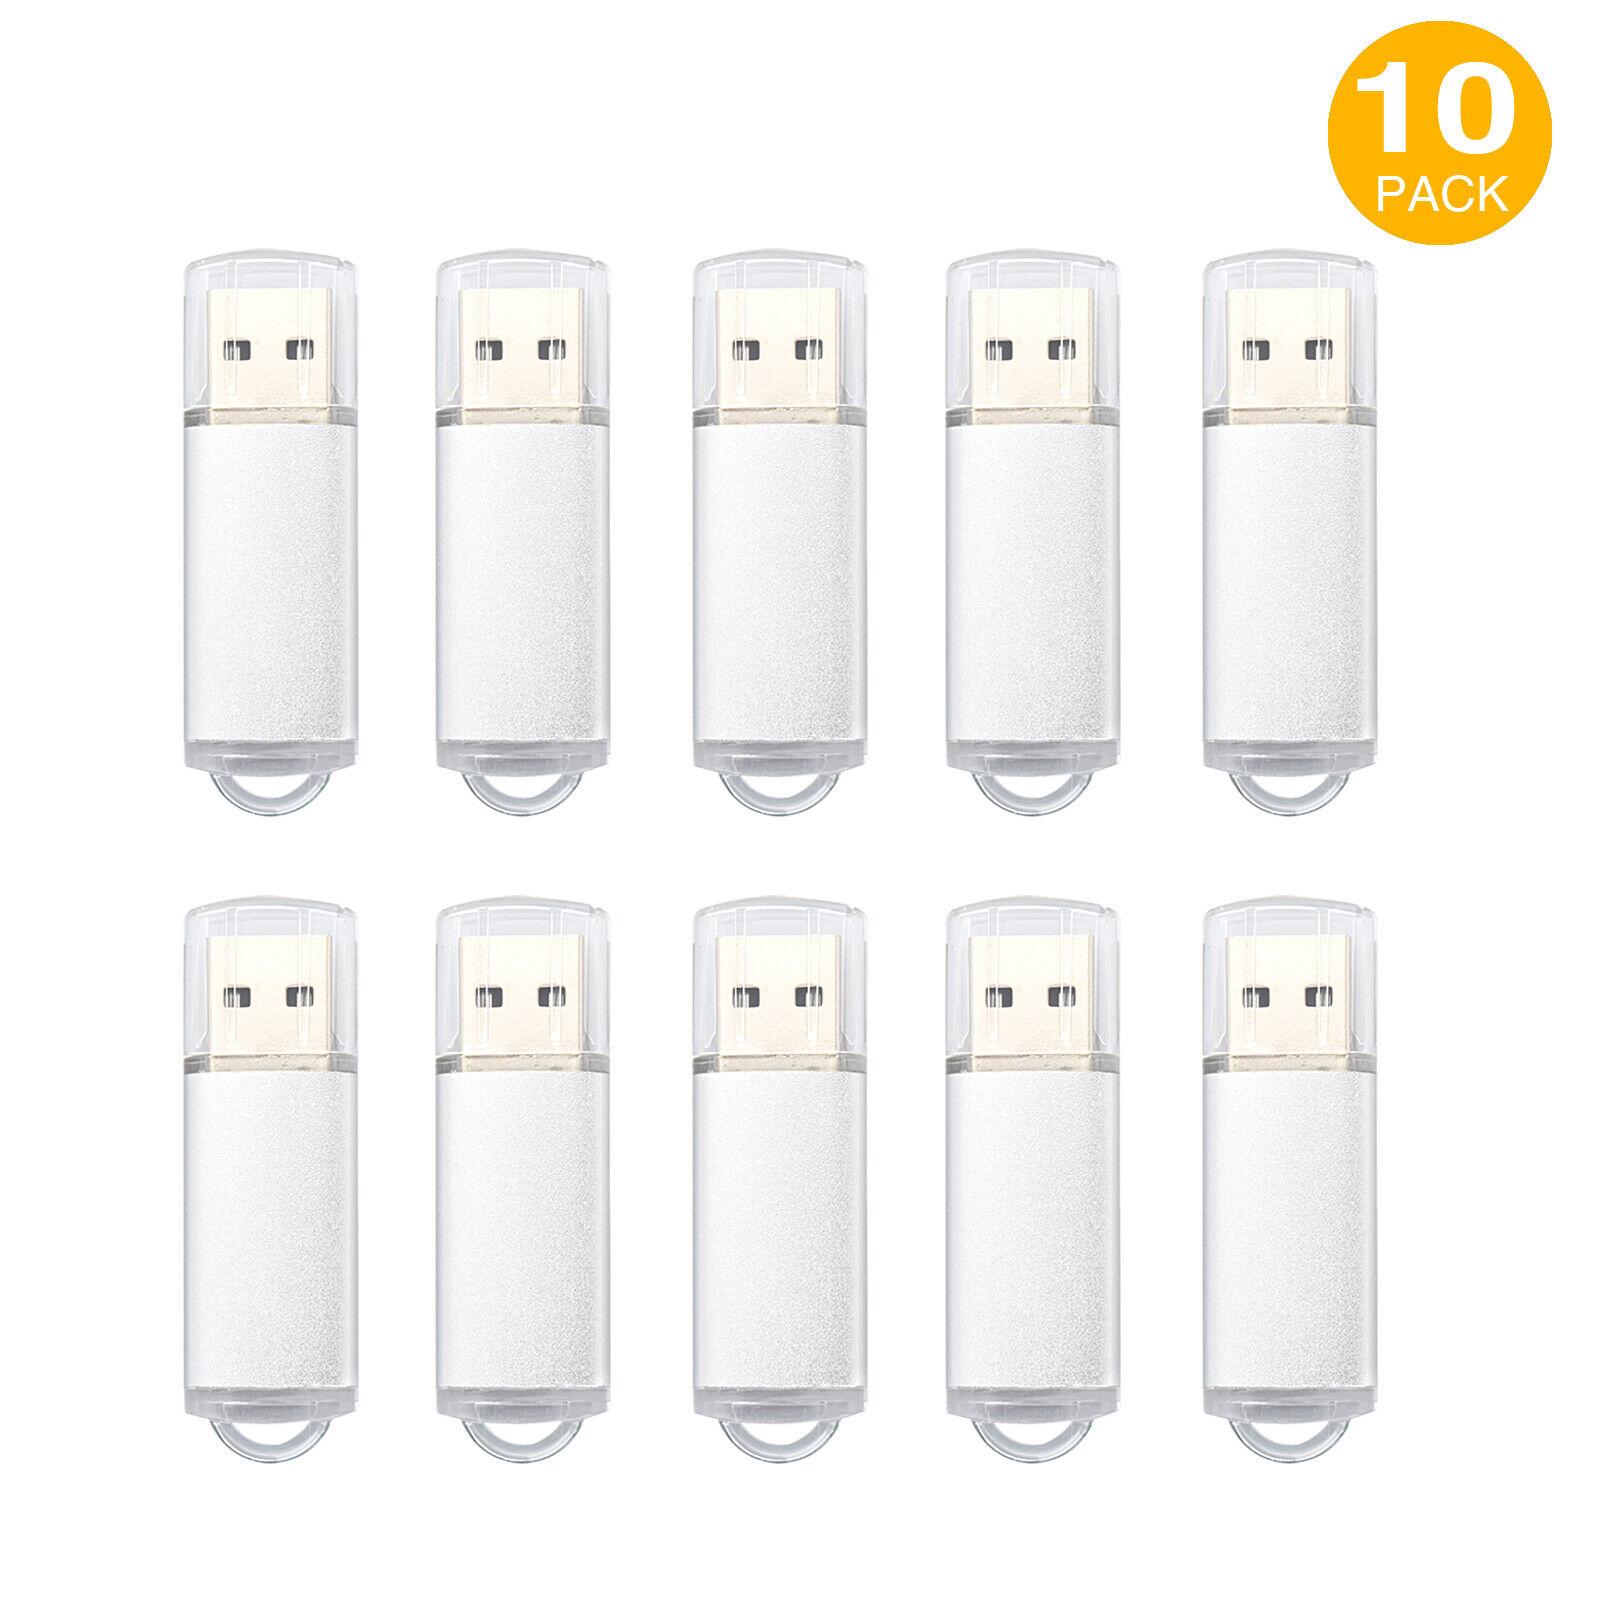 10Pack 1G 2G 4G 8G 16G USB Flash Drive Memory Stick Rectangle Thumb Pen Storage 125